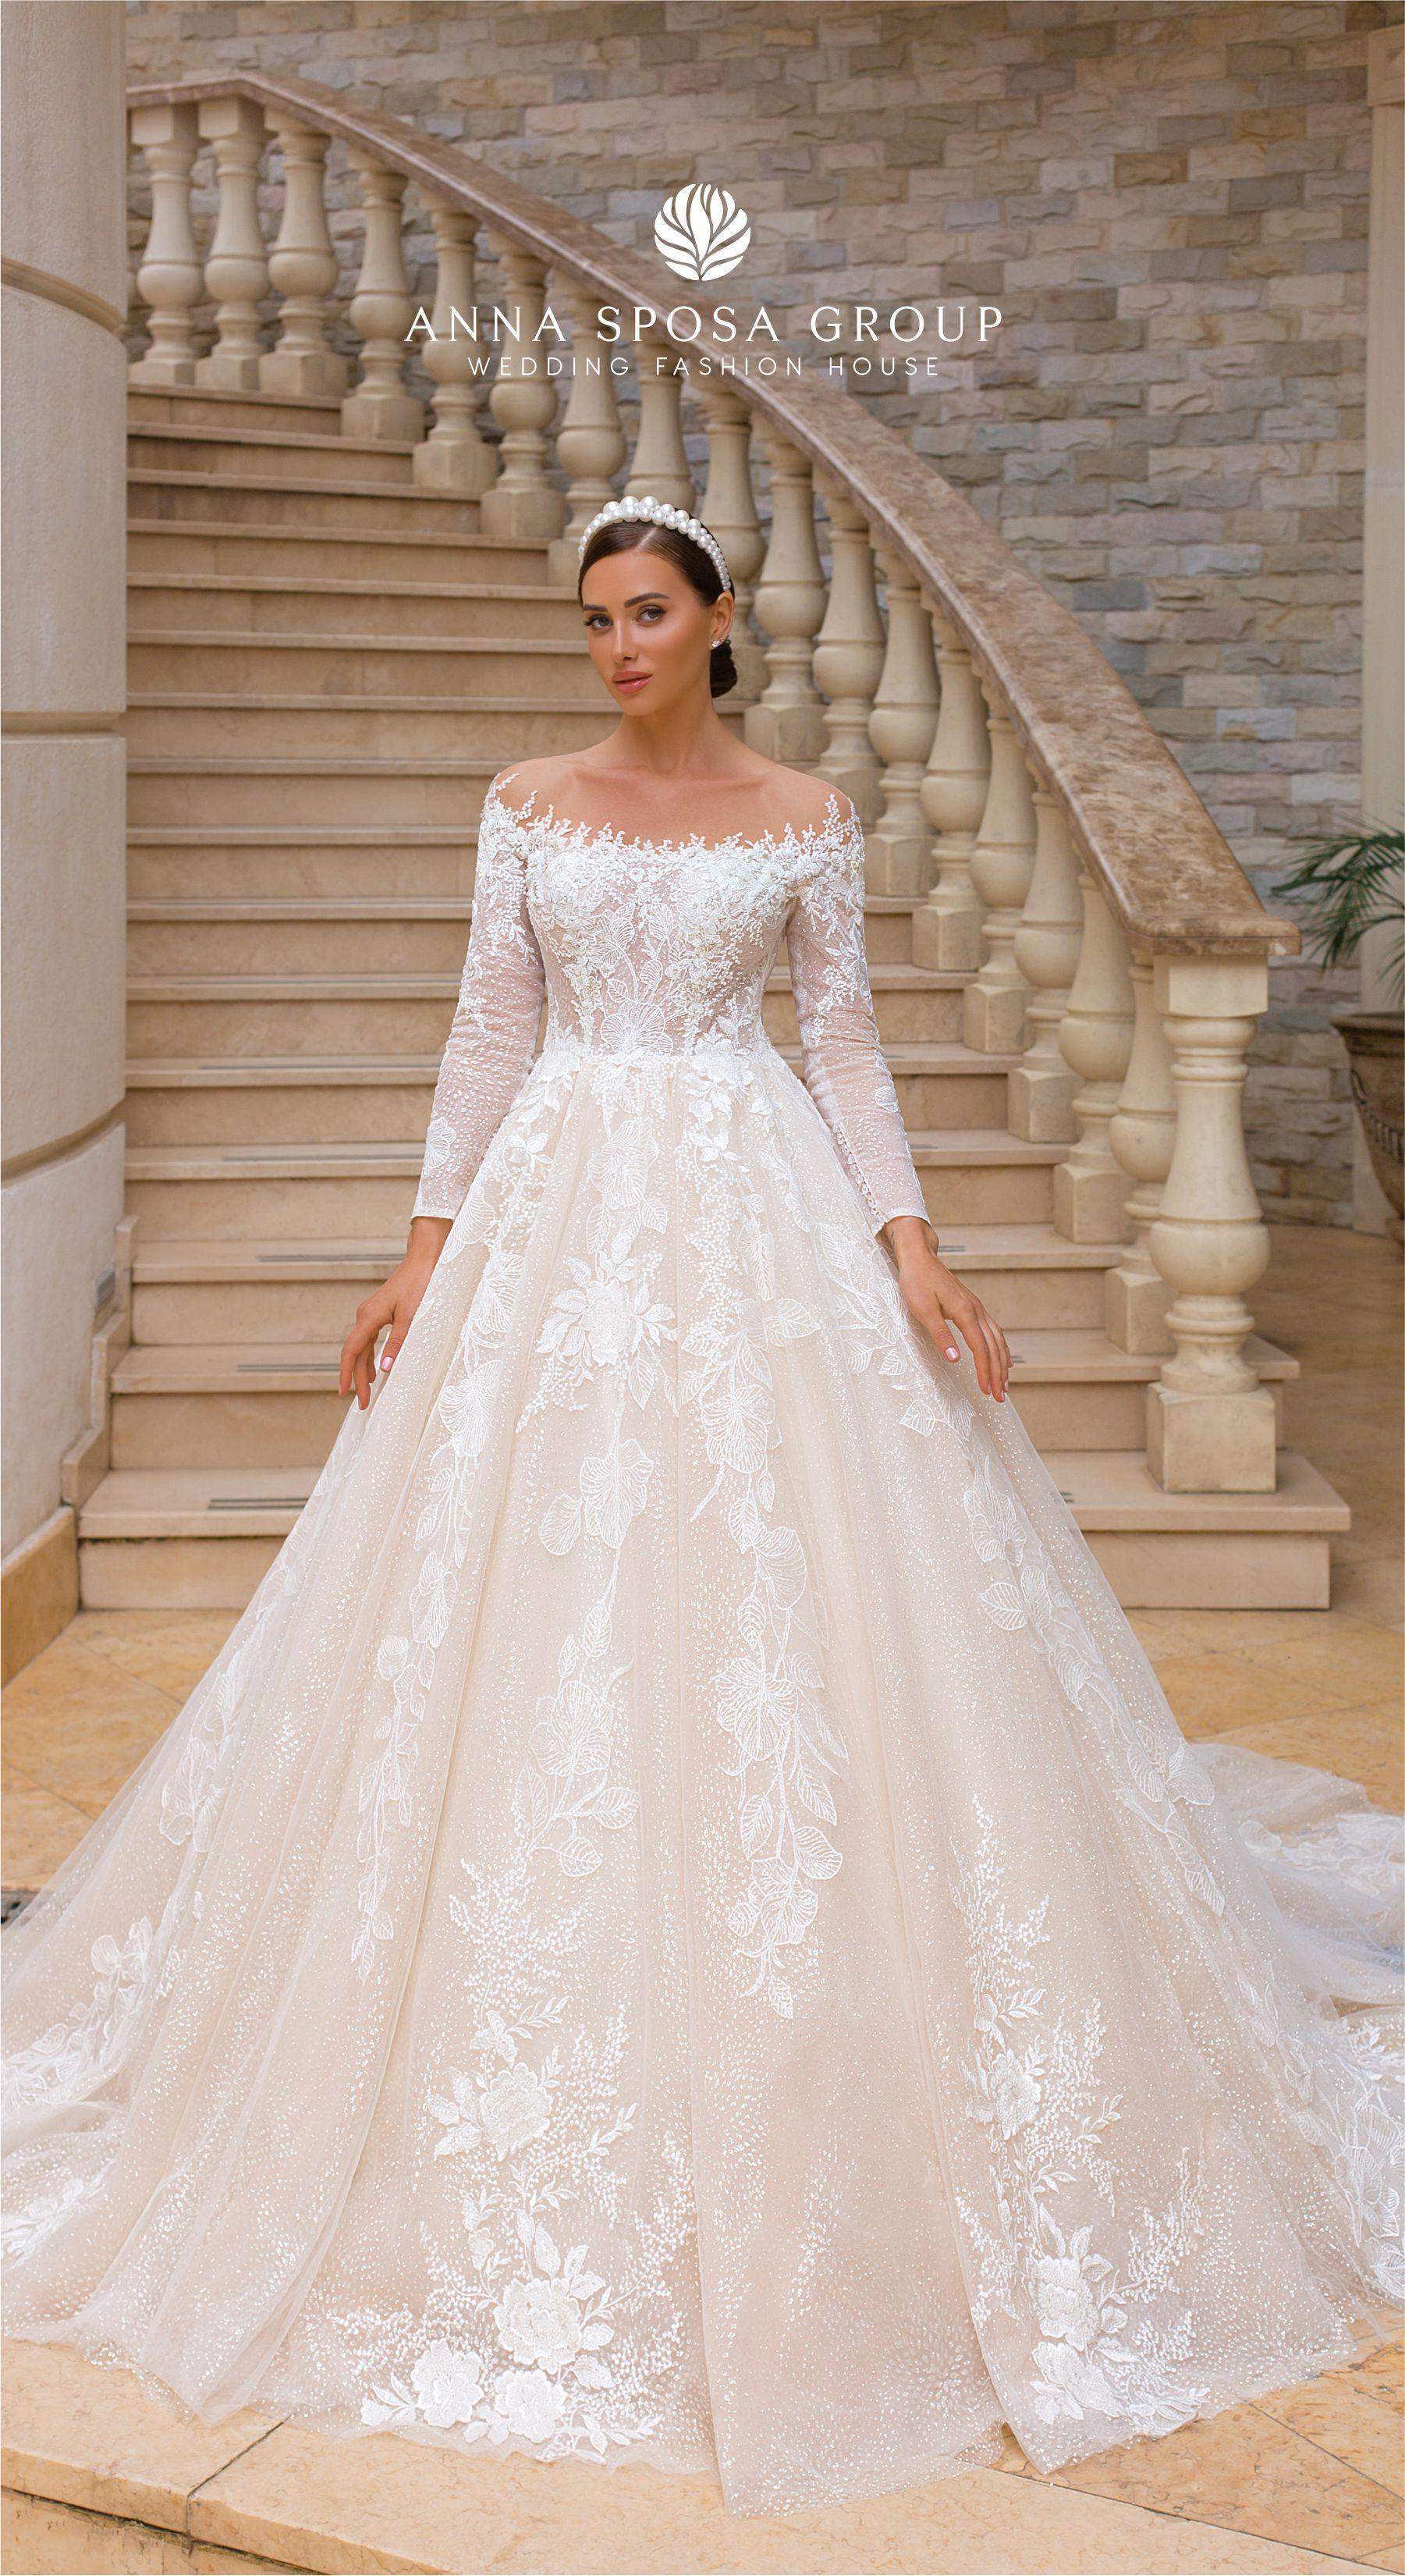 Gayai Wedding Dress Queen Inspired Collection Queen Wedding Dress Buy Wedding Dress Long Sleeve Princess Wedding Dresses [ 3301 x 1801 Pixel ]